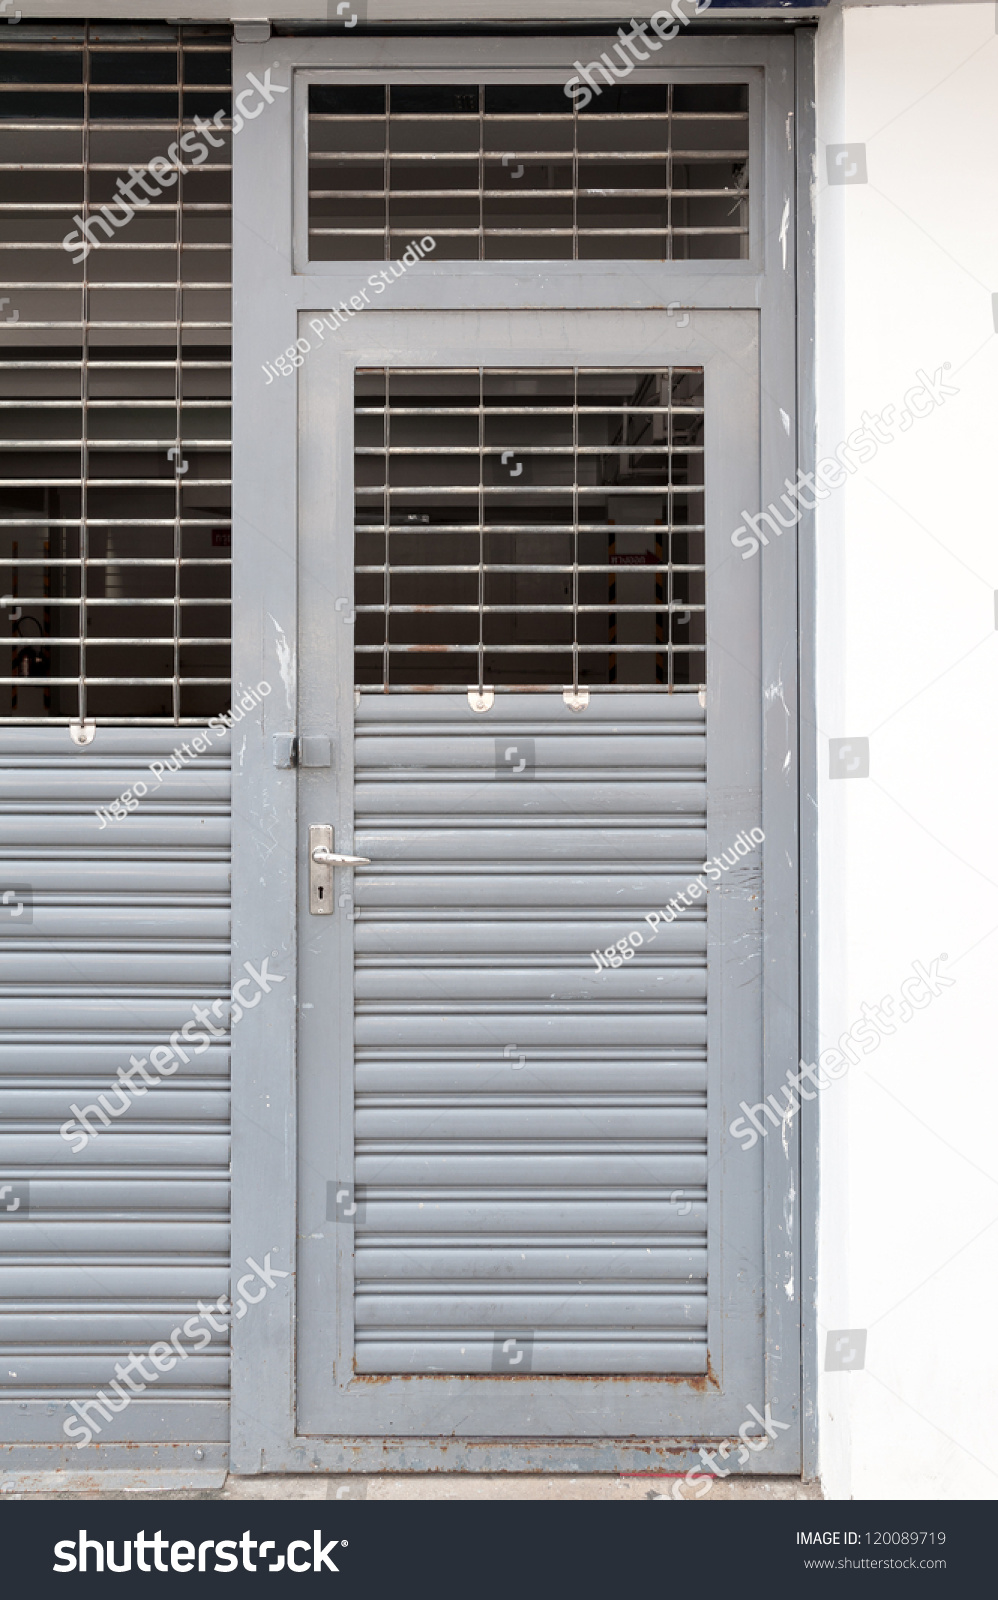 old metal swing door with half ventilation void & Old Metal Swing Door Half Ventilation Stock Photo (Royalty Free ...